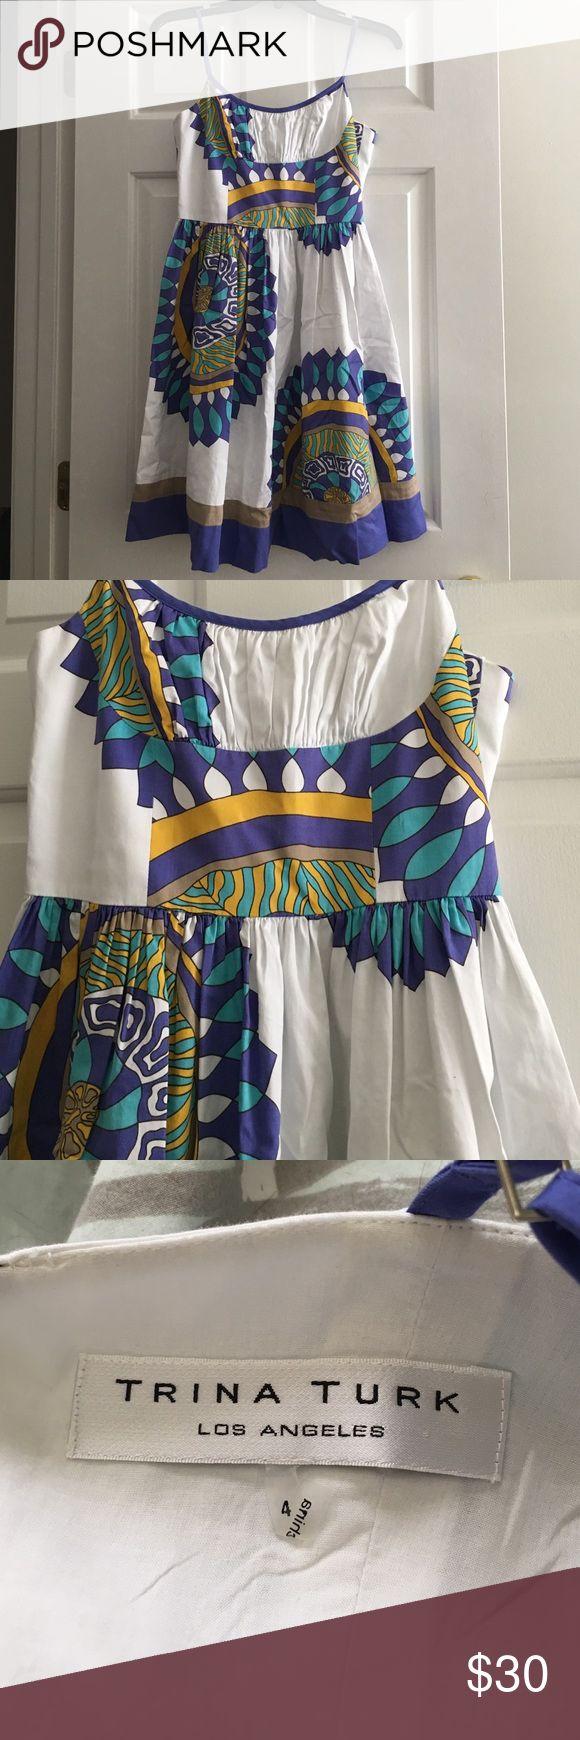 Trina Turk dress Purple and teal dress.  Adorable on. Trina Turk Dresses Midi